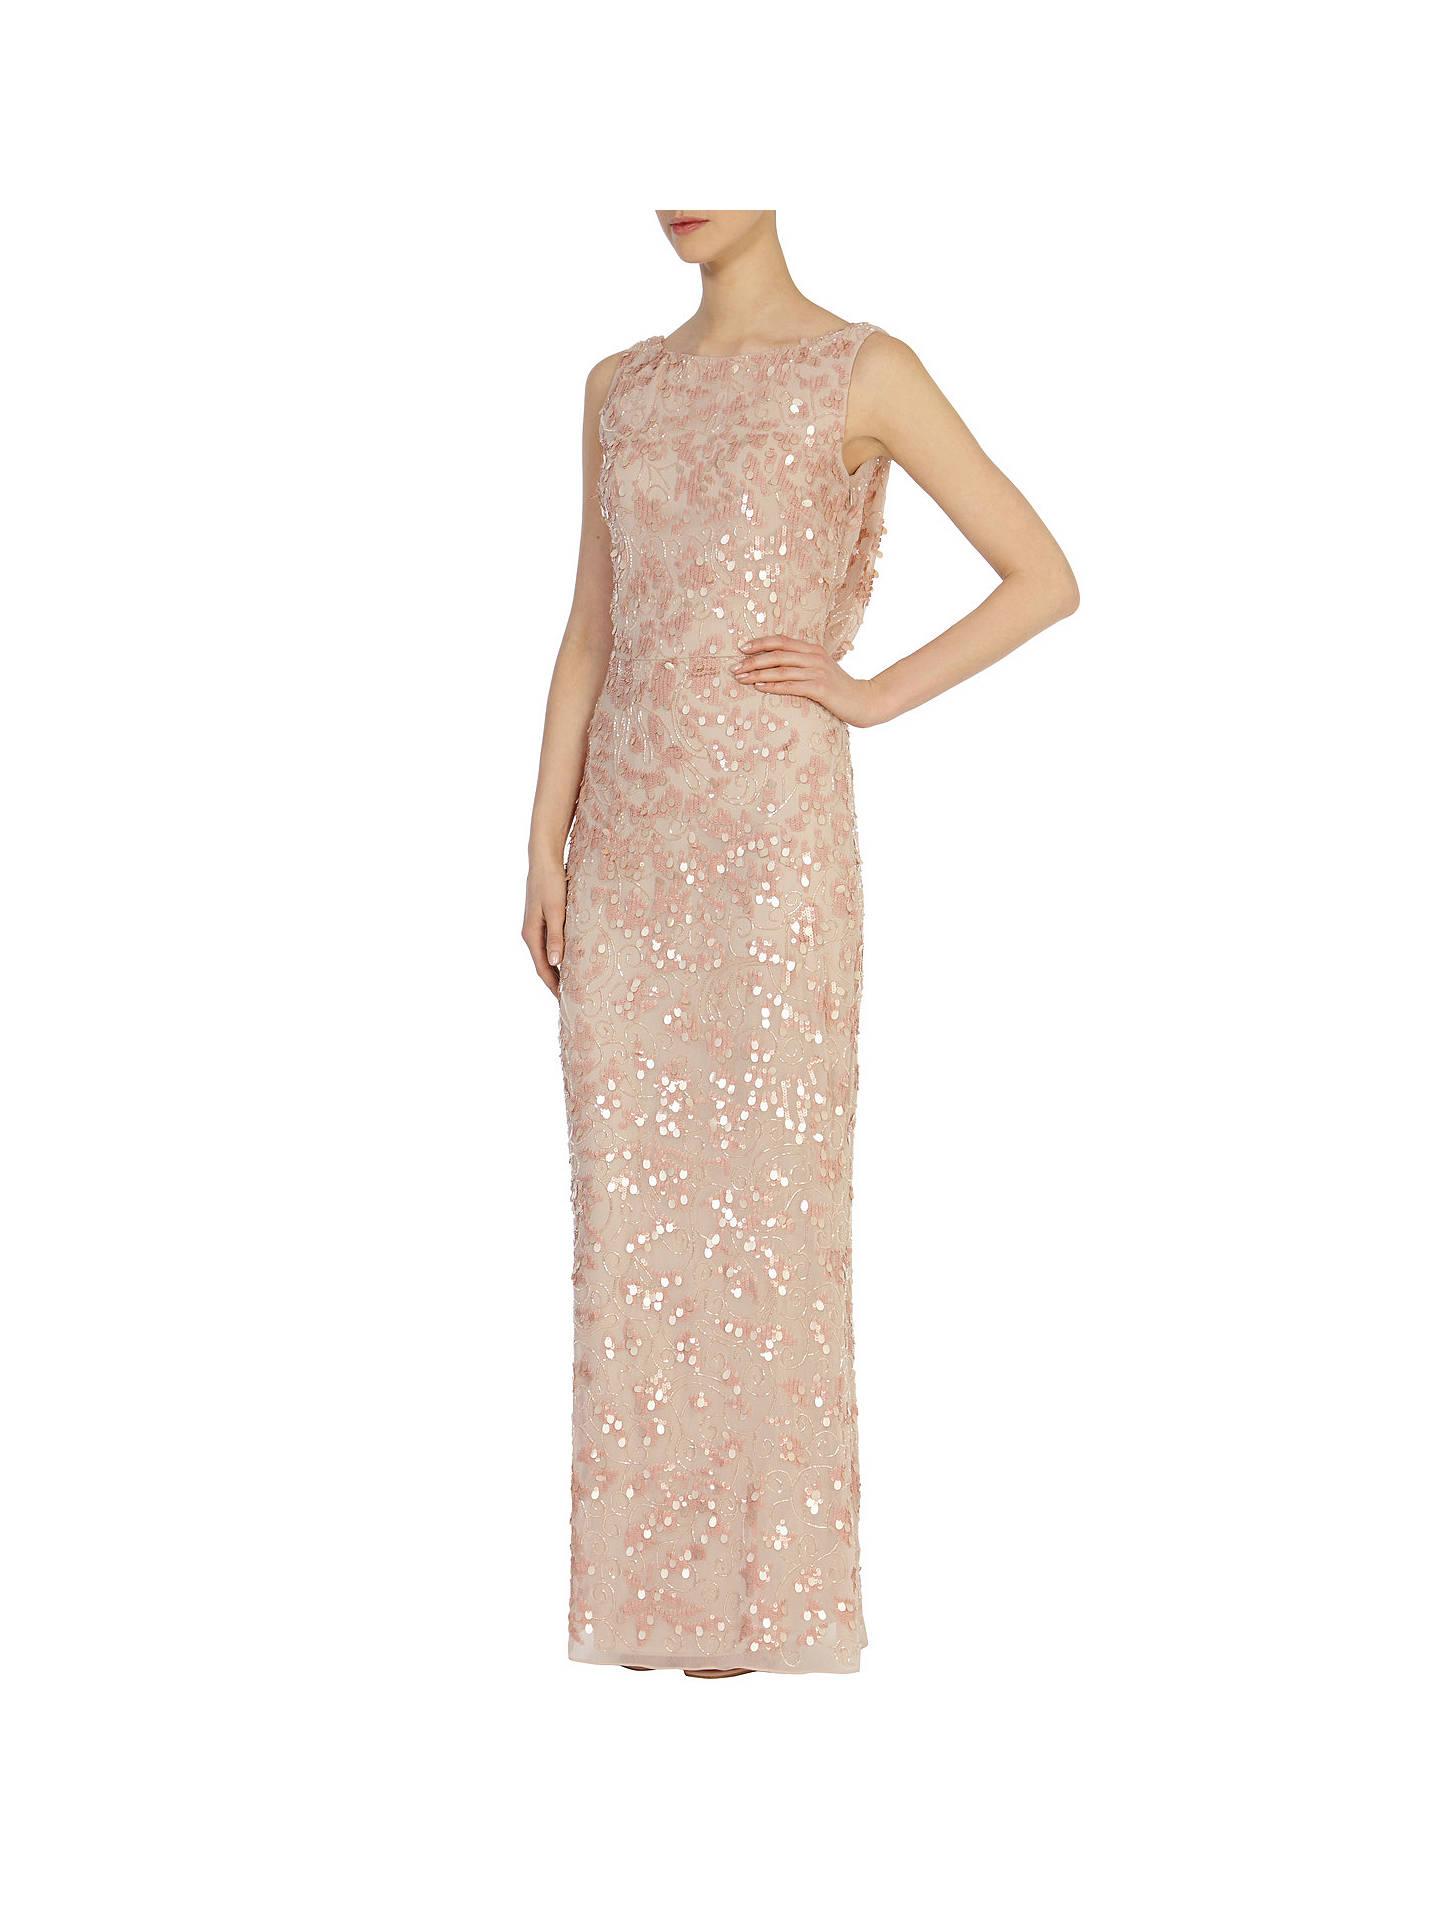 3720219c ... Buy Coast Felix Sequin Maxi Dress, Blush, 6 Online at johnlewis.com ...